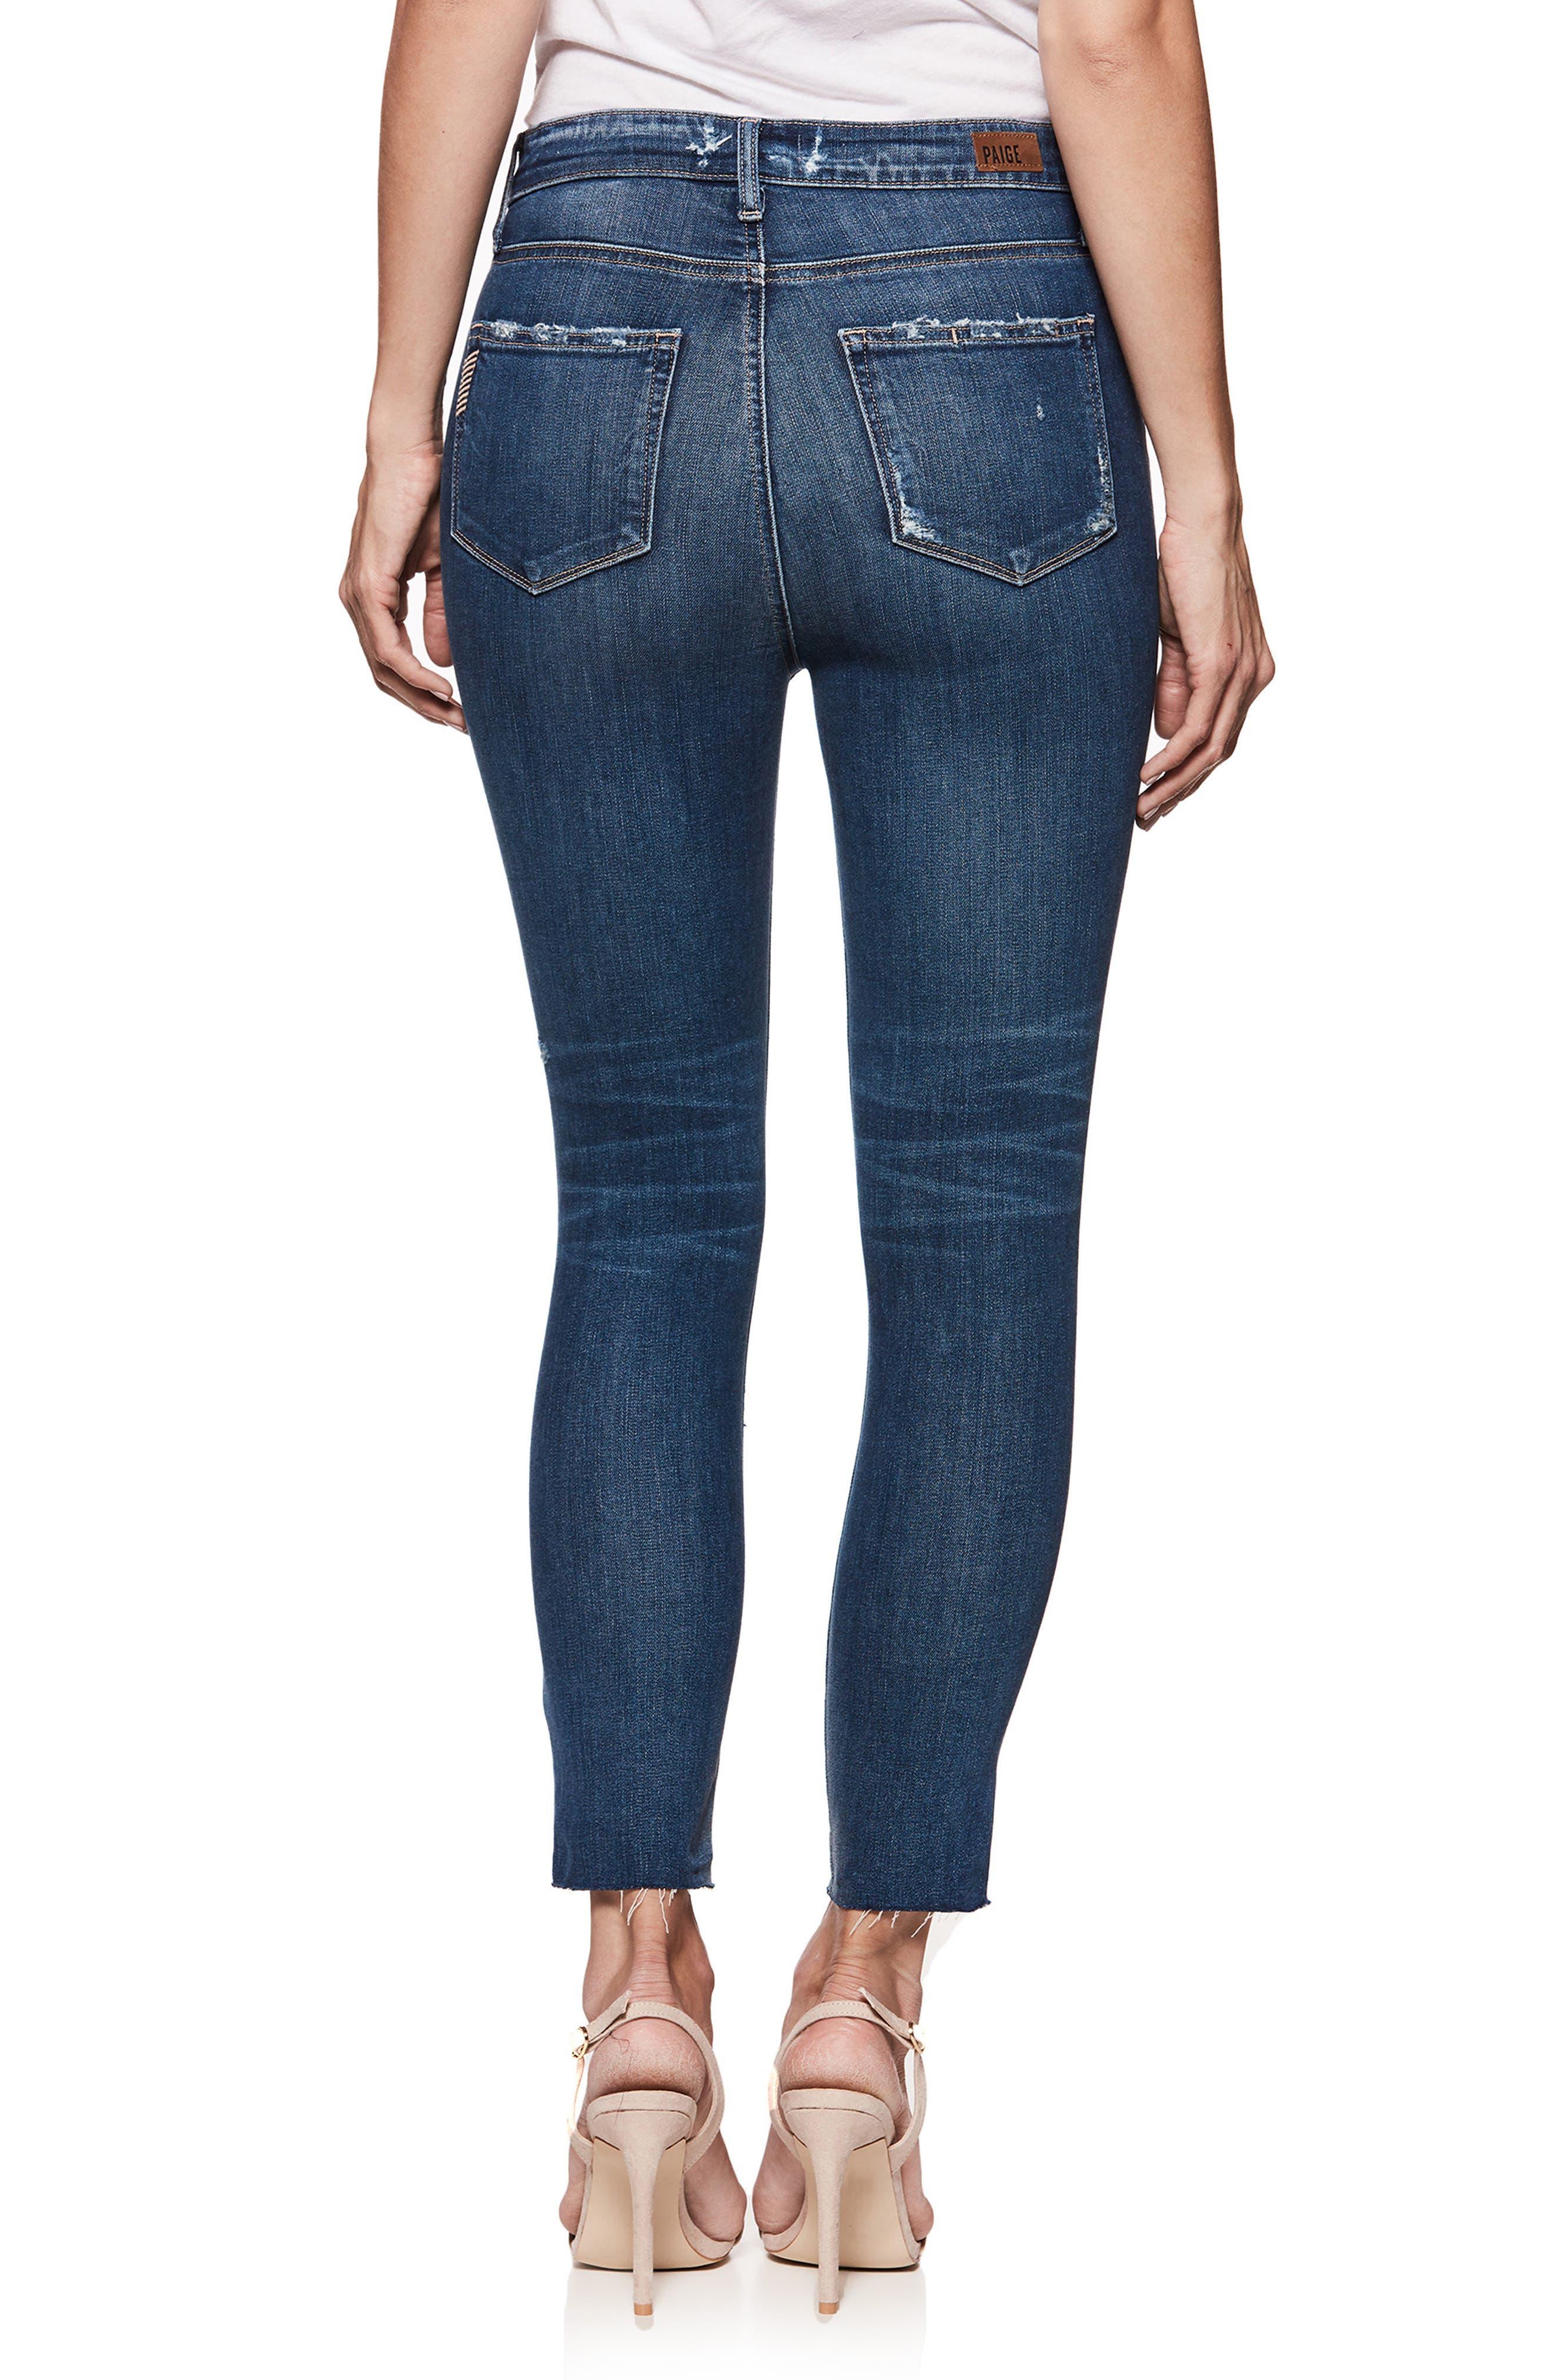 Transcend Vintage - Margot High Waist Crop Skinny Jeans,                             Alternate thumbnail 3, color,                             Cliffs Edge Destructed